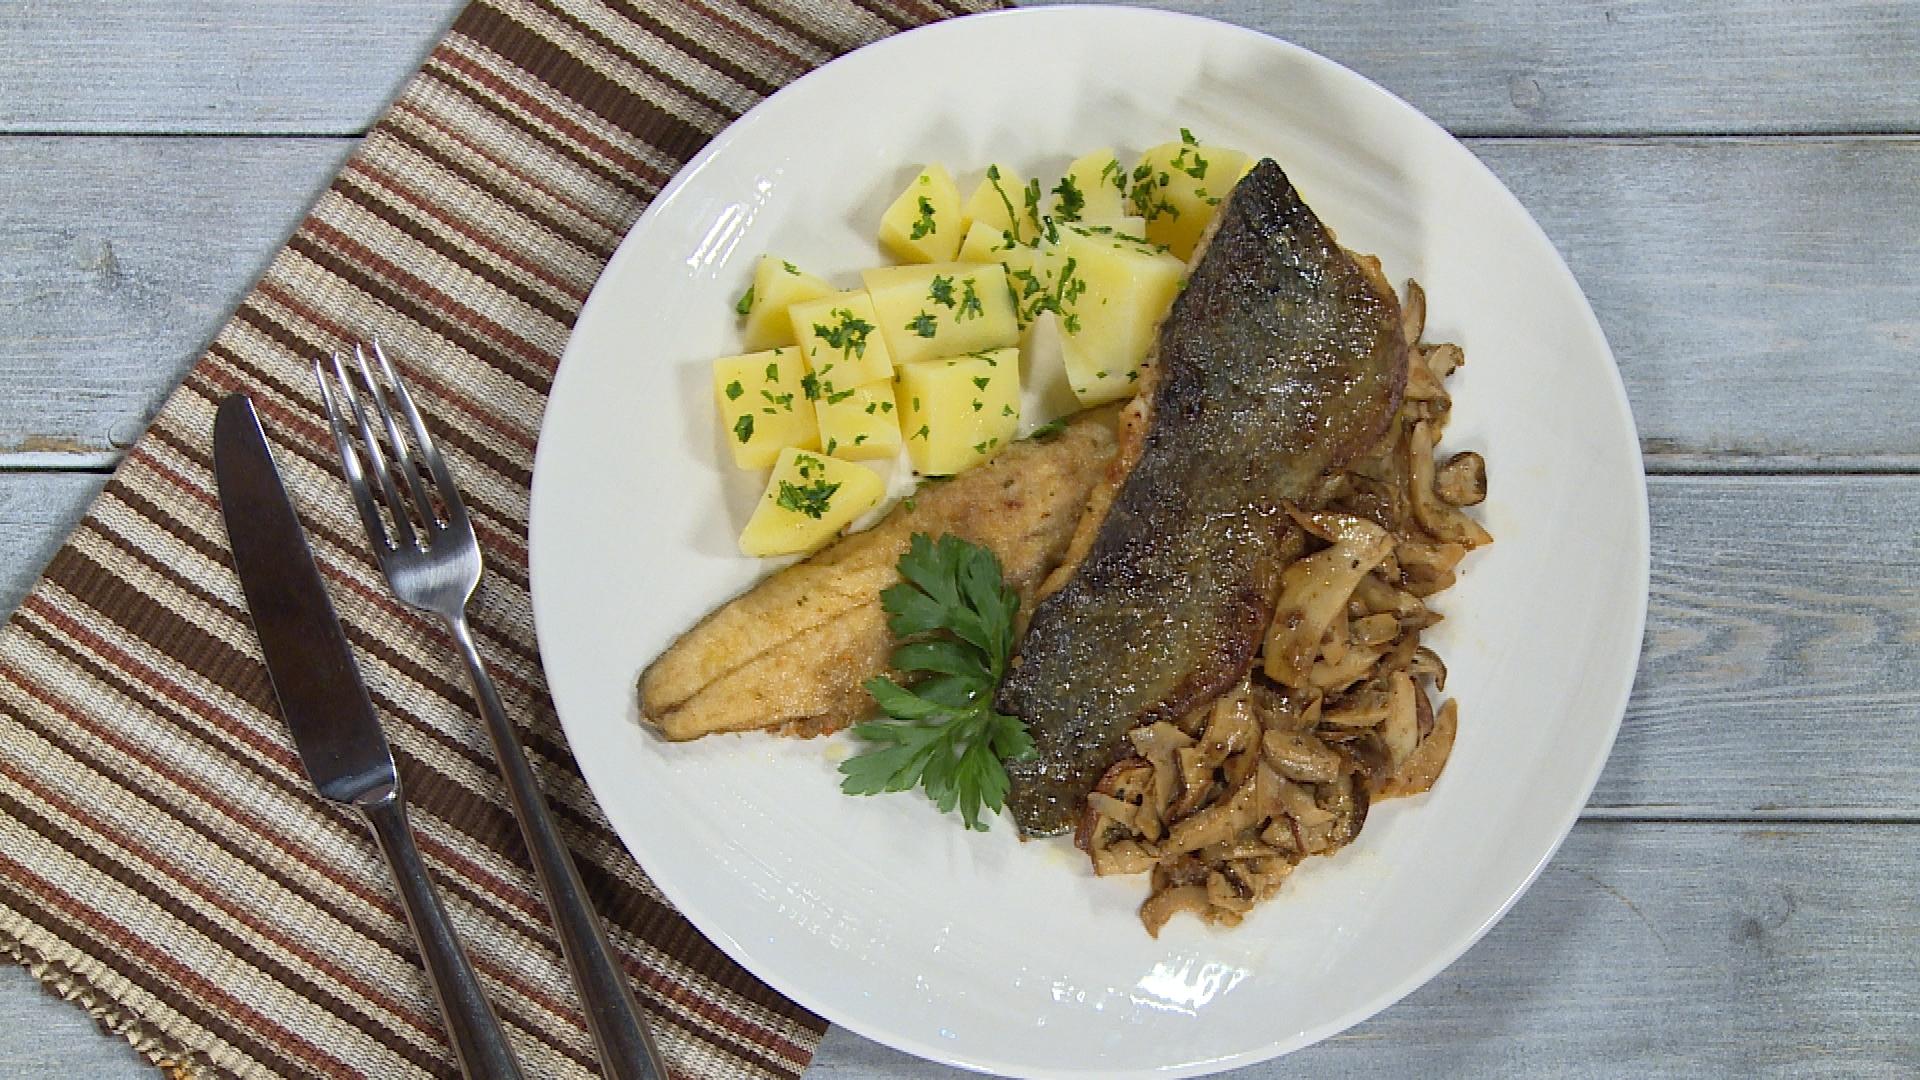 Pastrva s vrganjima i kuhanim krumpirom